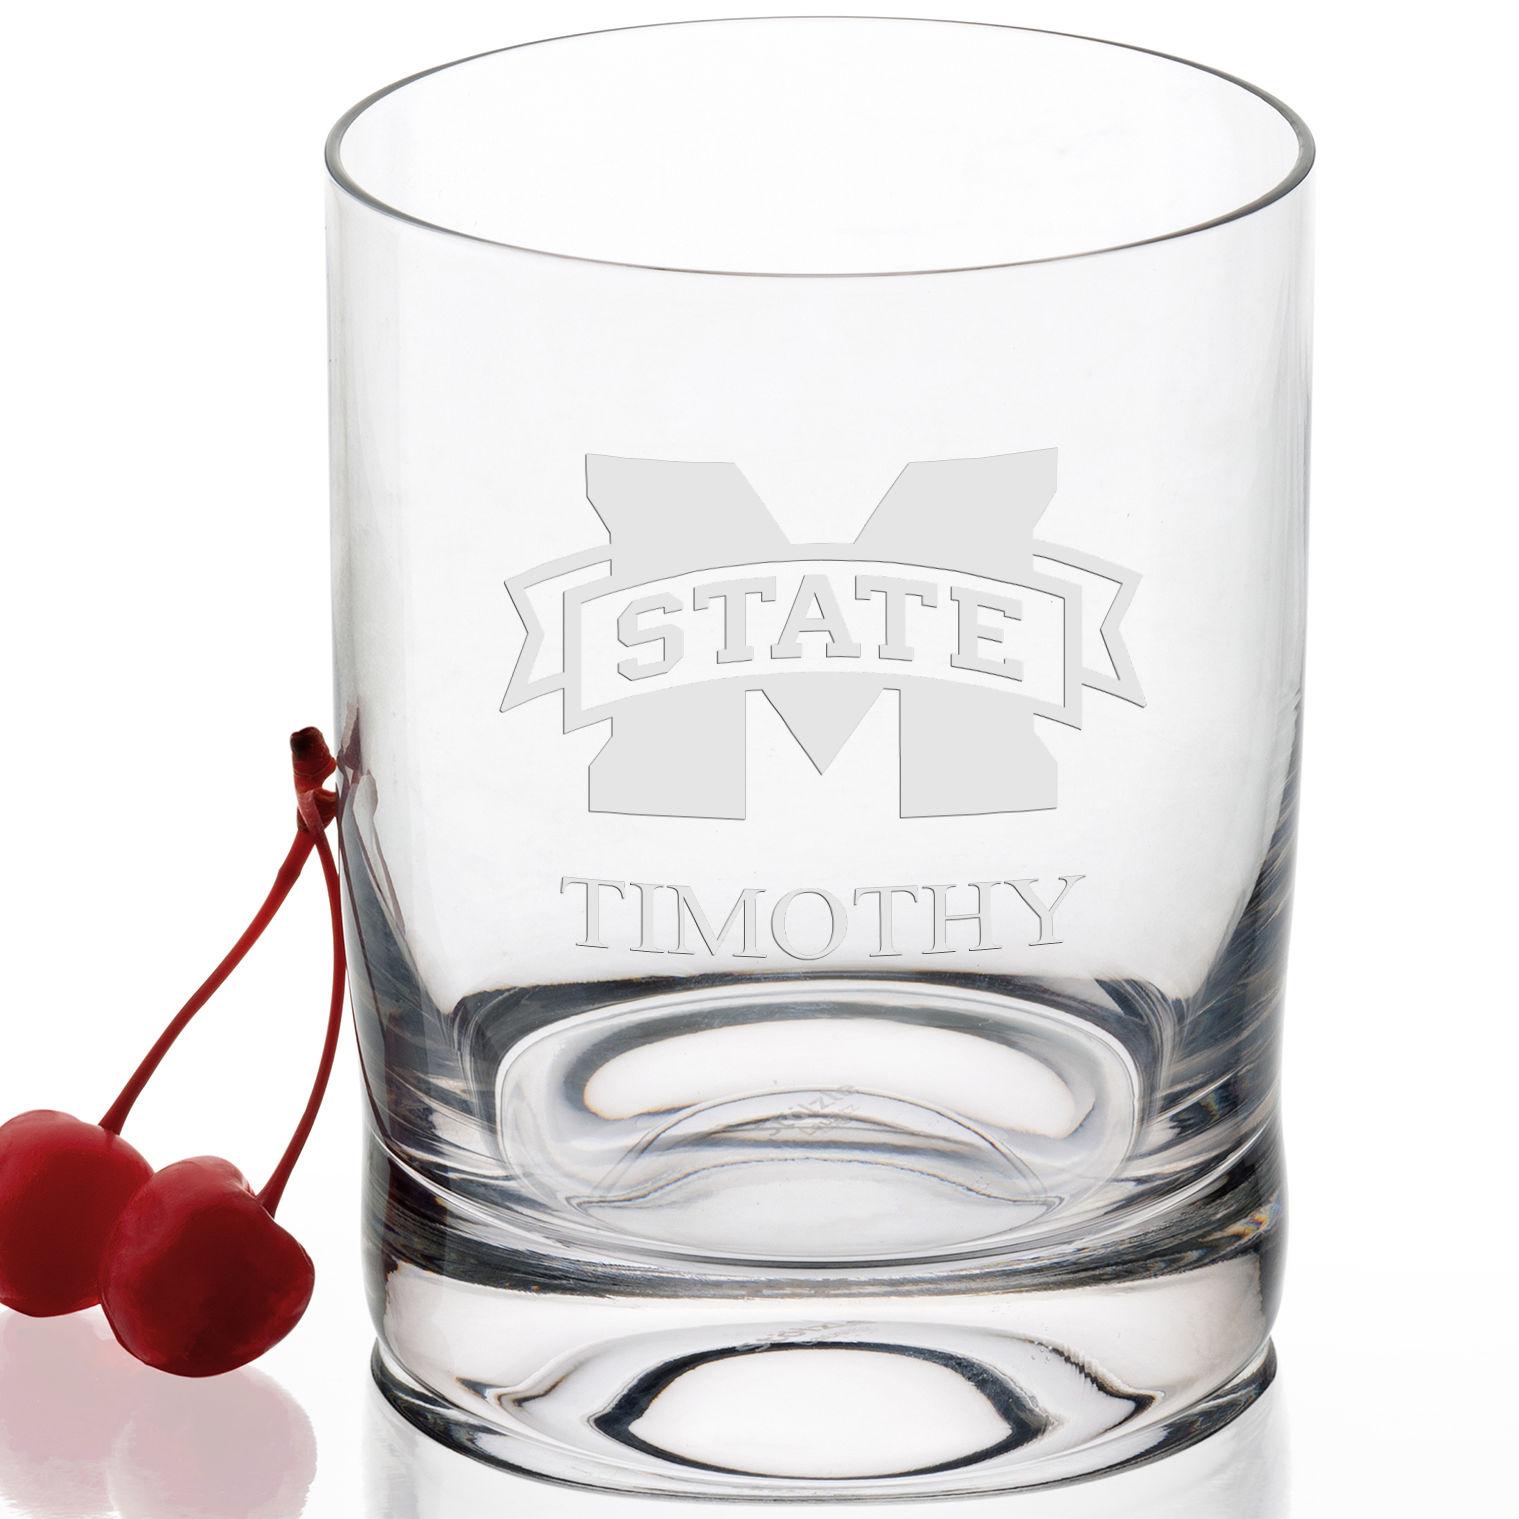 Mississippi State Tumbler Glasses - Set of 4 - Image 2